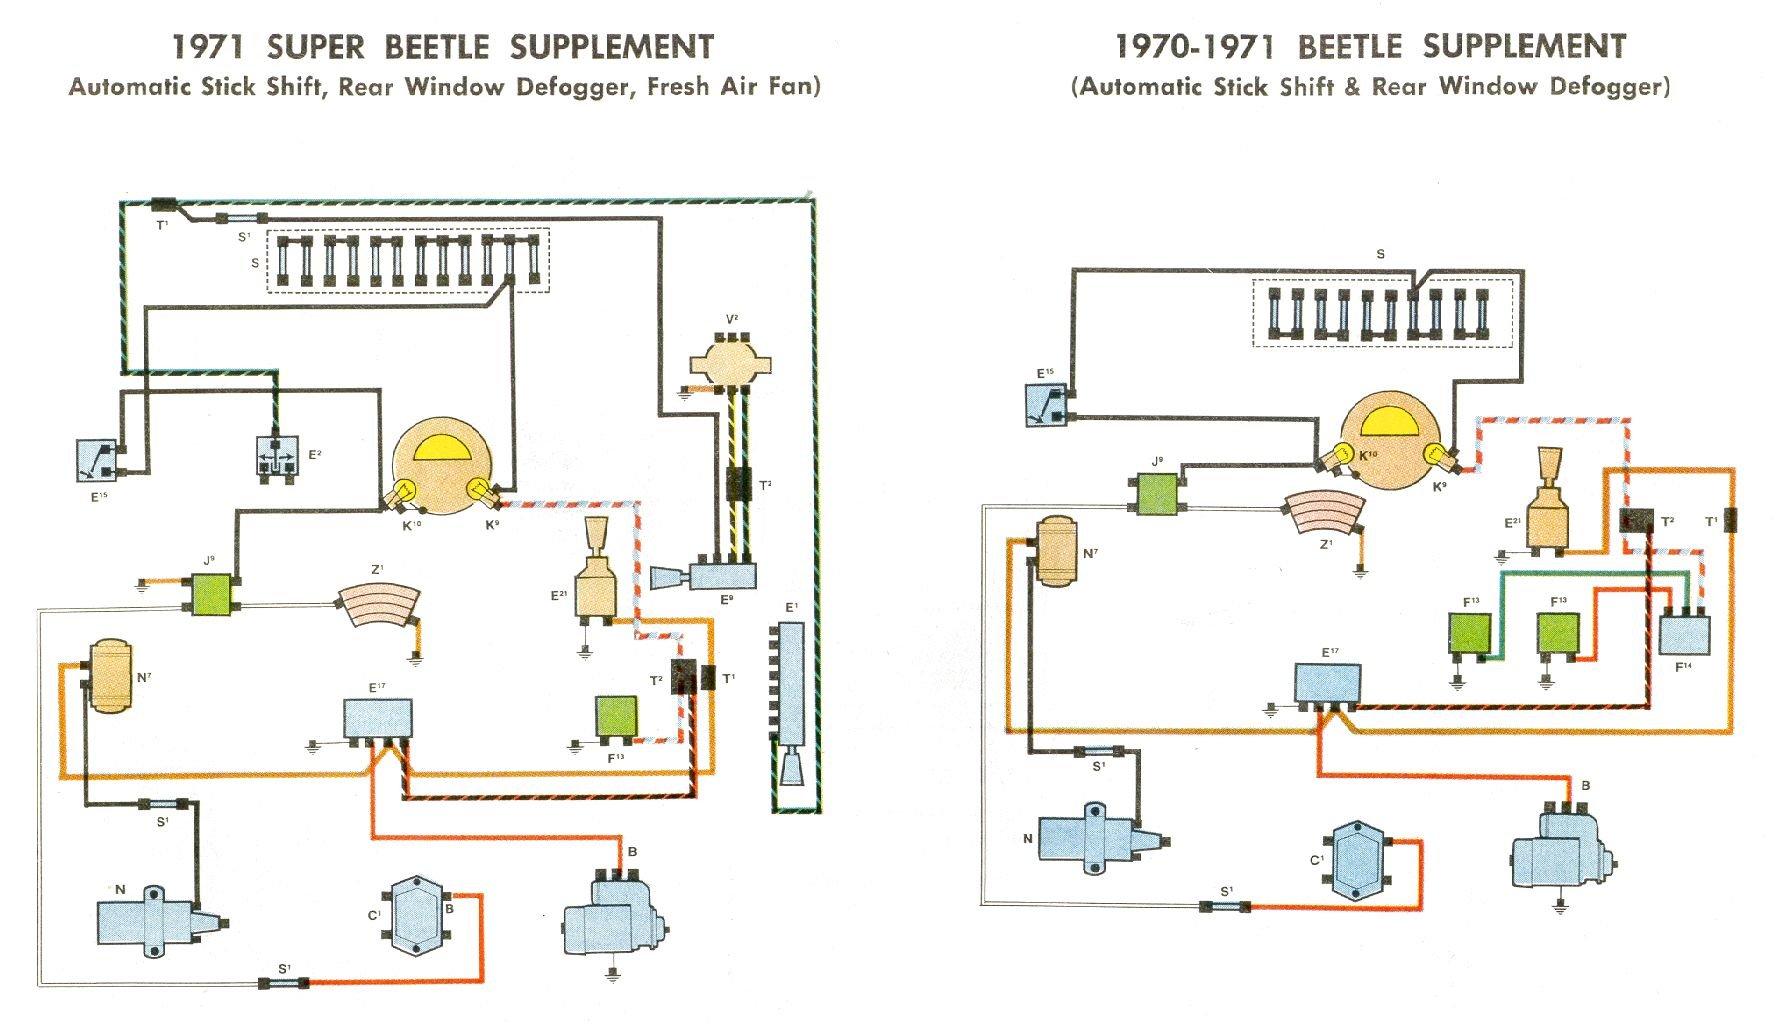 hight resolution of http www thesamba com vw archives info wiring bug 7071 supplement jpg